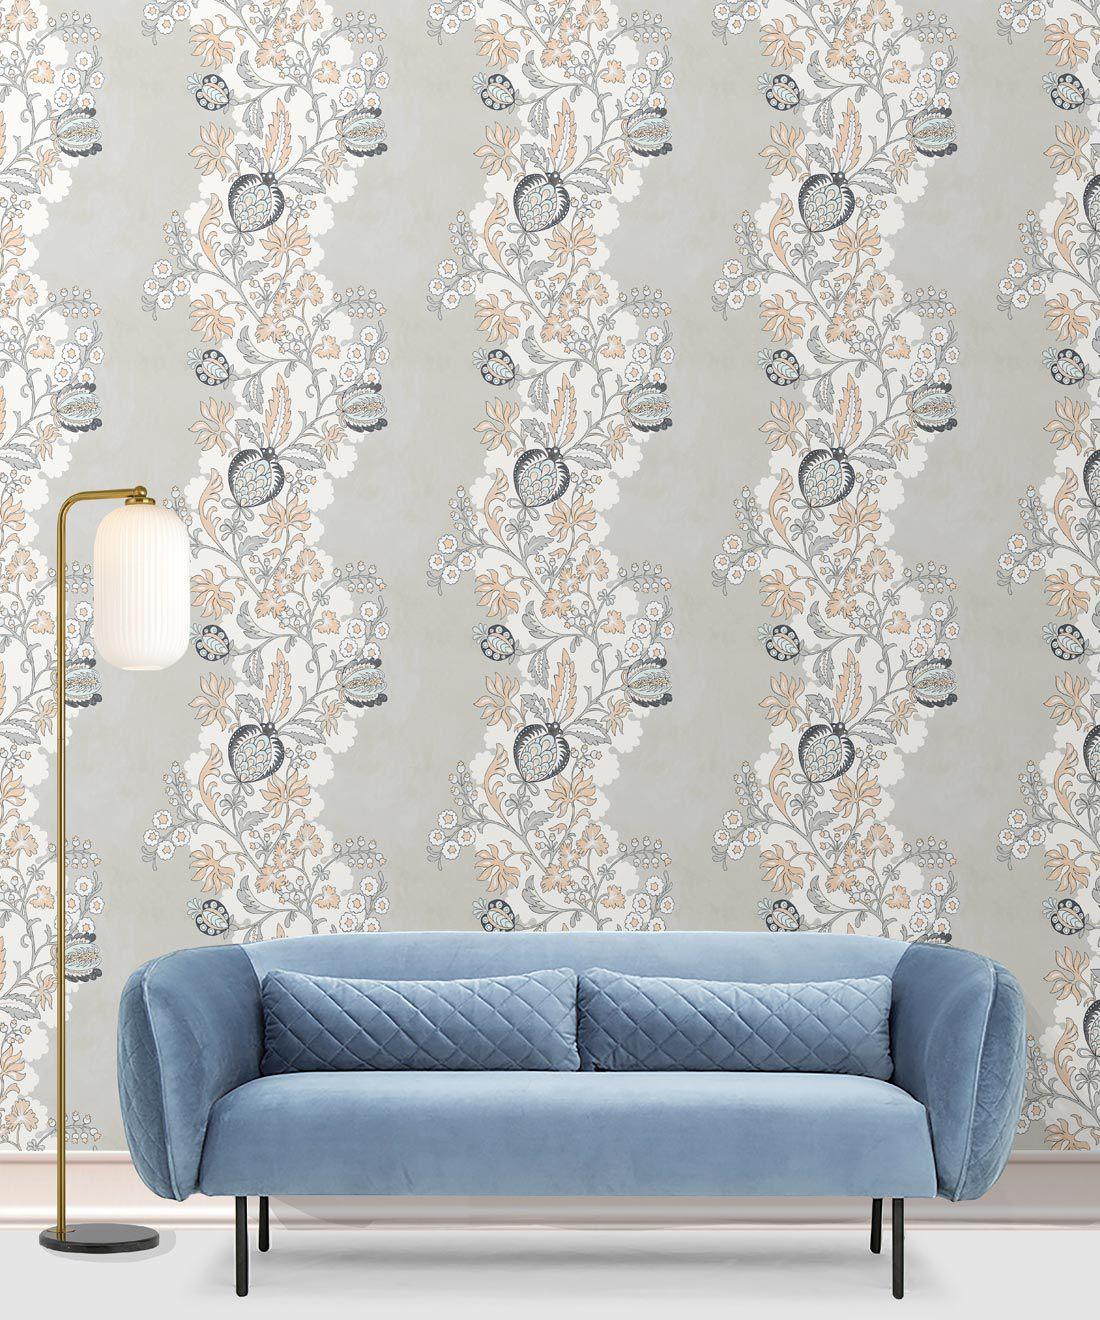 Pomegranate Wallpaper • salmon • insitu with blue sofa